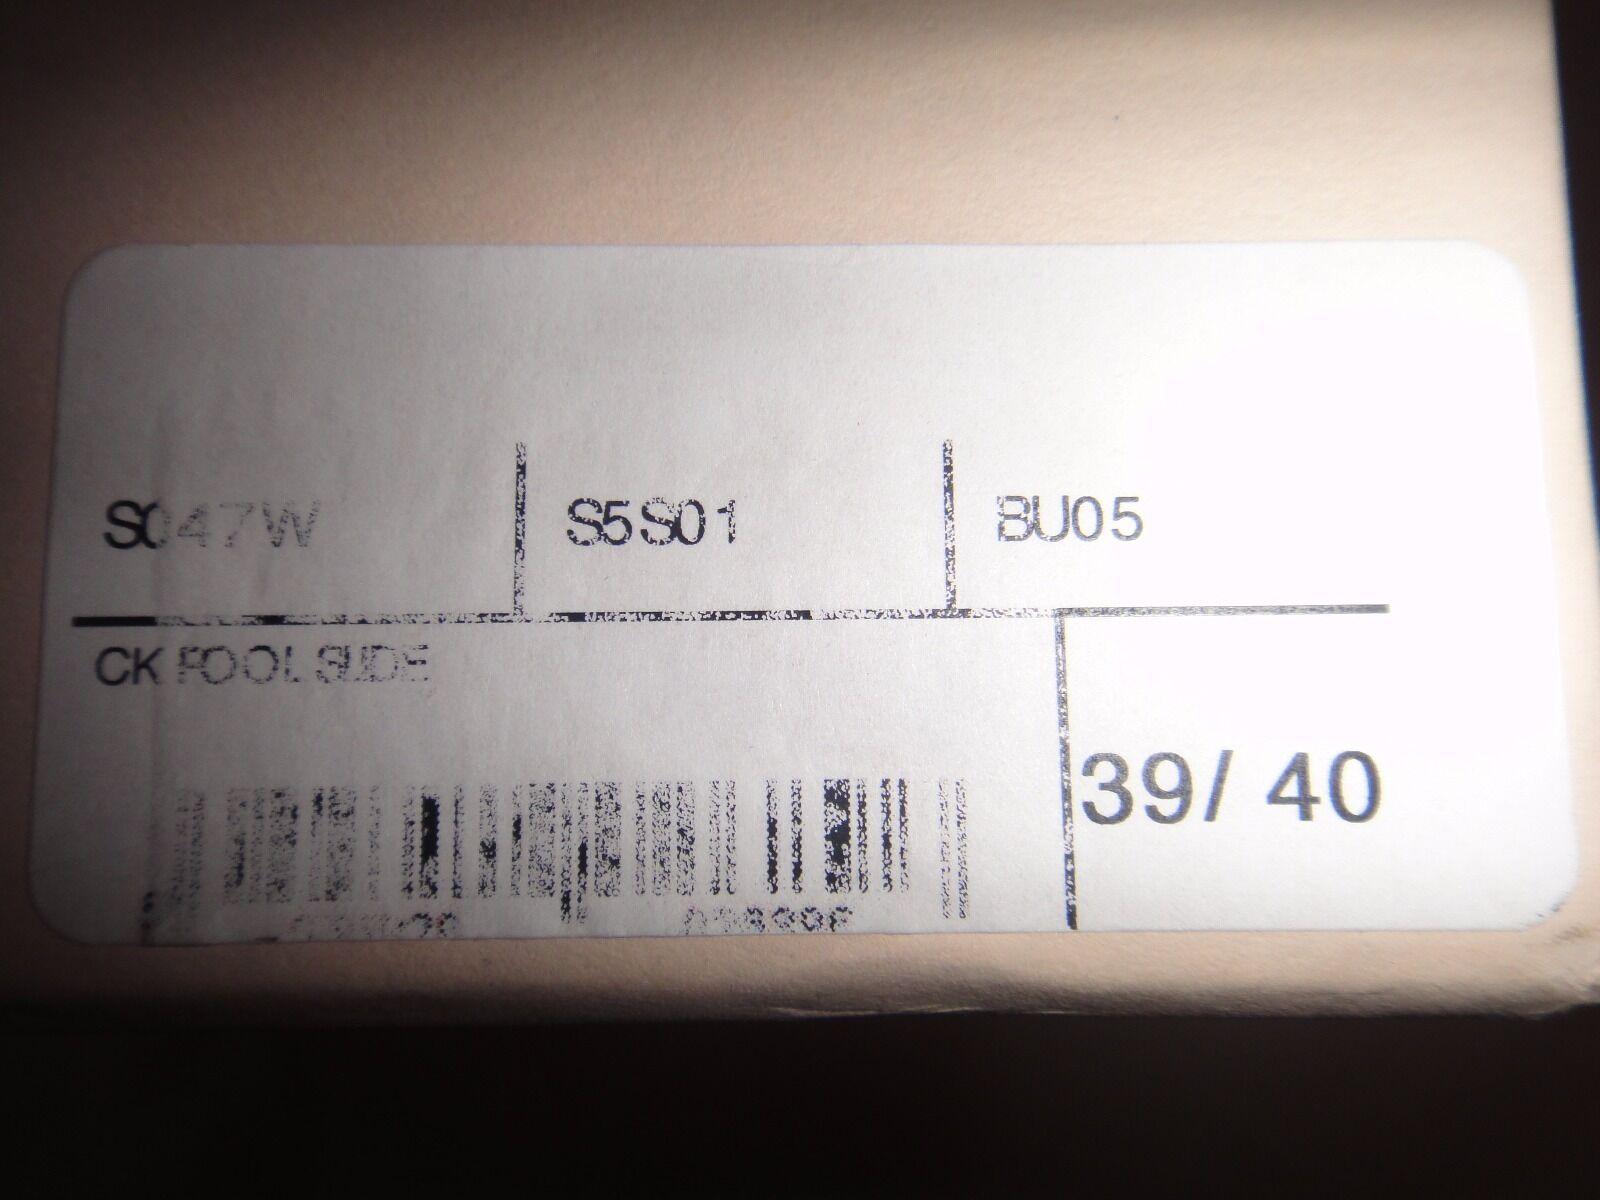 Christopher Kane Marroneee pelle GIGANTE Crystal Crystal Crystal POOL CURSORI TG 6 57bc4f